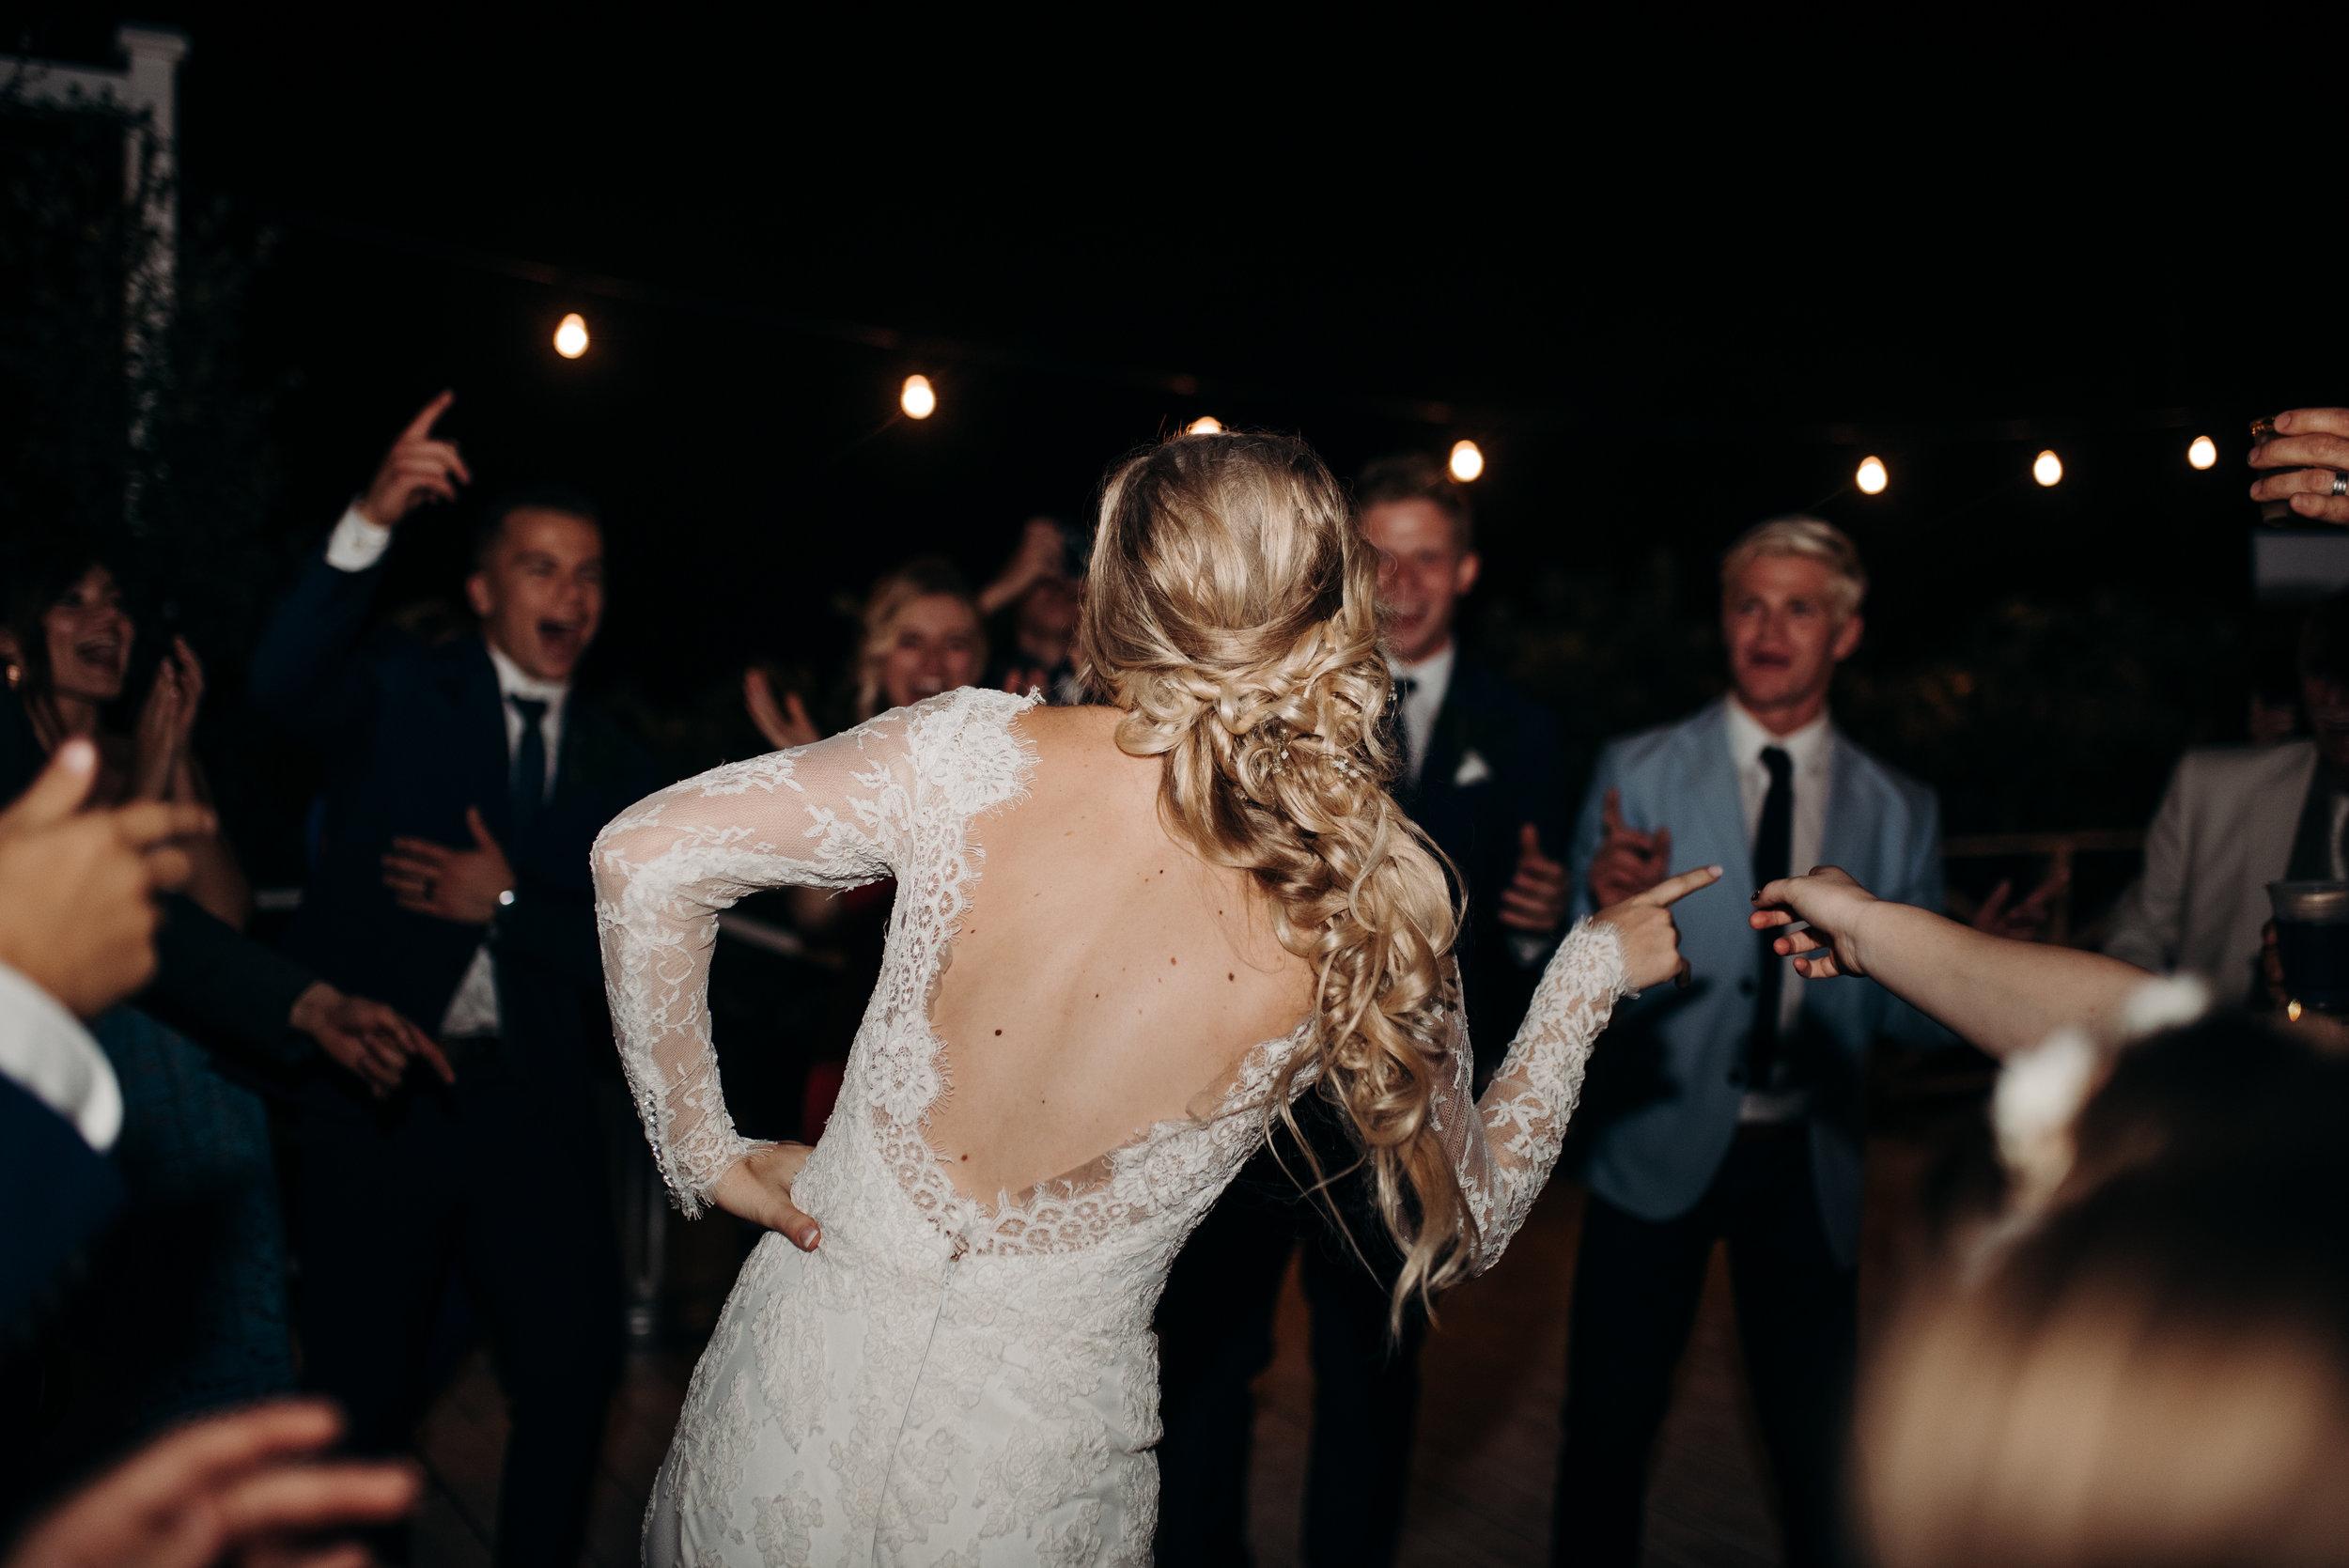 micayla-greyson-neumann-vero-beach-lake-house-winter-white-wedding-photography-1344.jpg